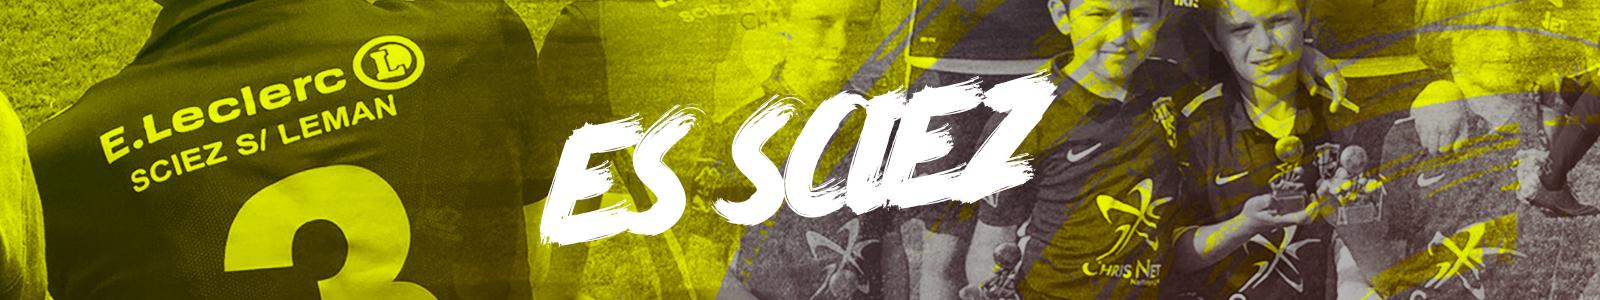 Eveil-Sportive de Sciez : site officiel du club de foot de SCIEZ - footeo